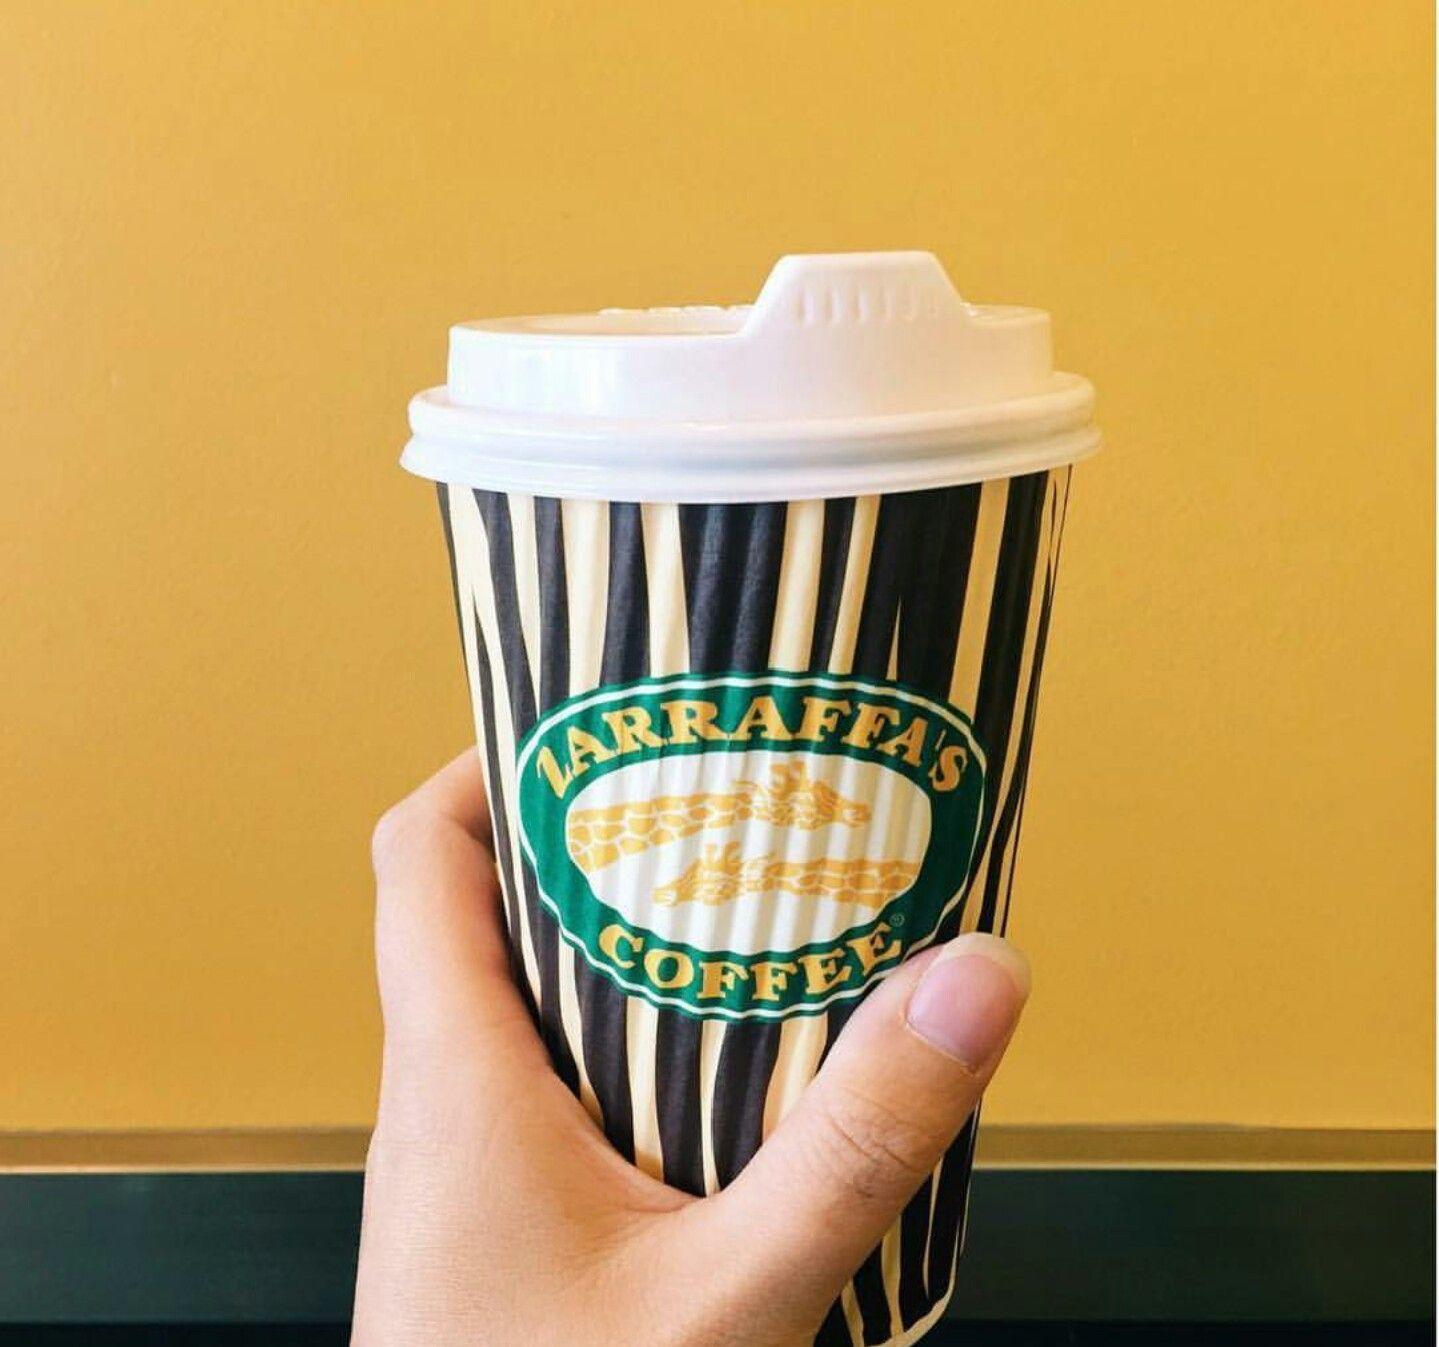 Pin By Debbie Blakemore On Zarraffas Coffee Townsville Australia Glassware Tableware Coffee